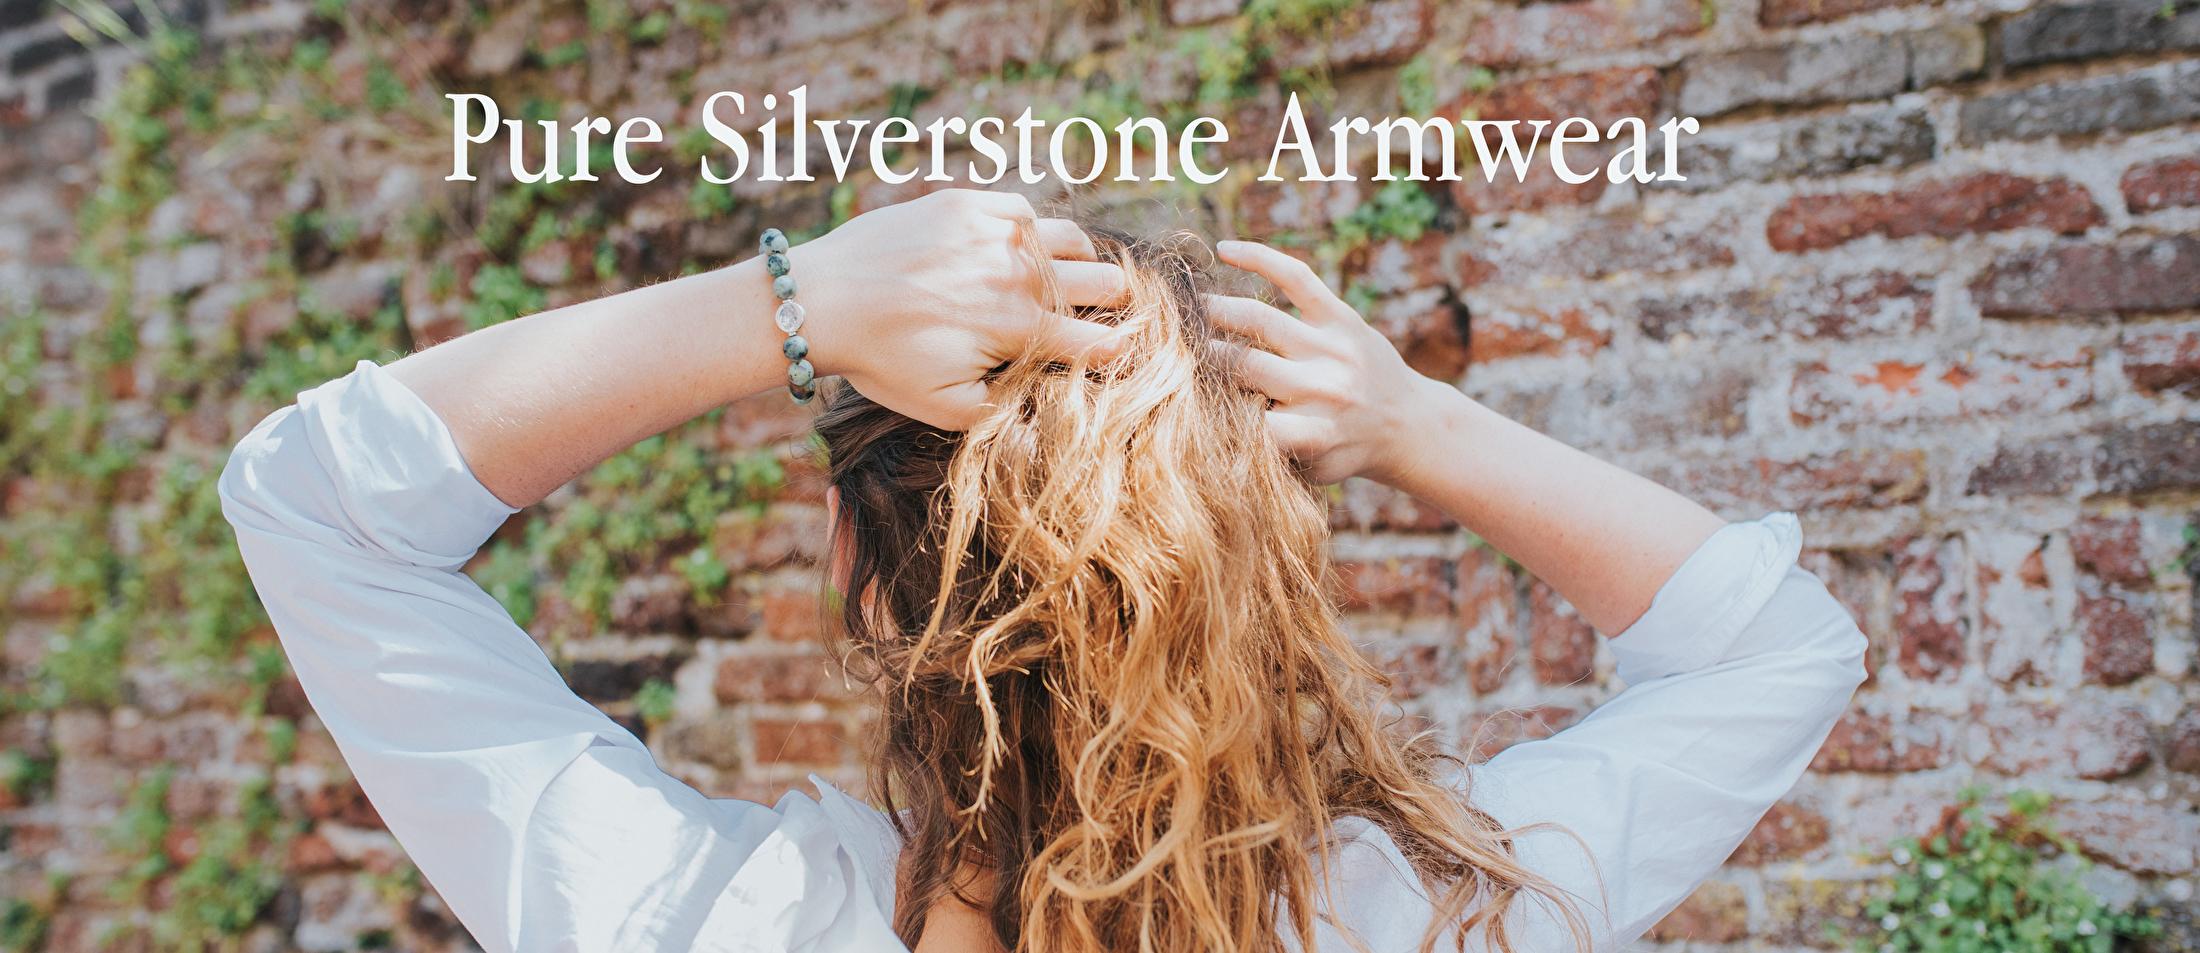 Pure Silverstone Armwear